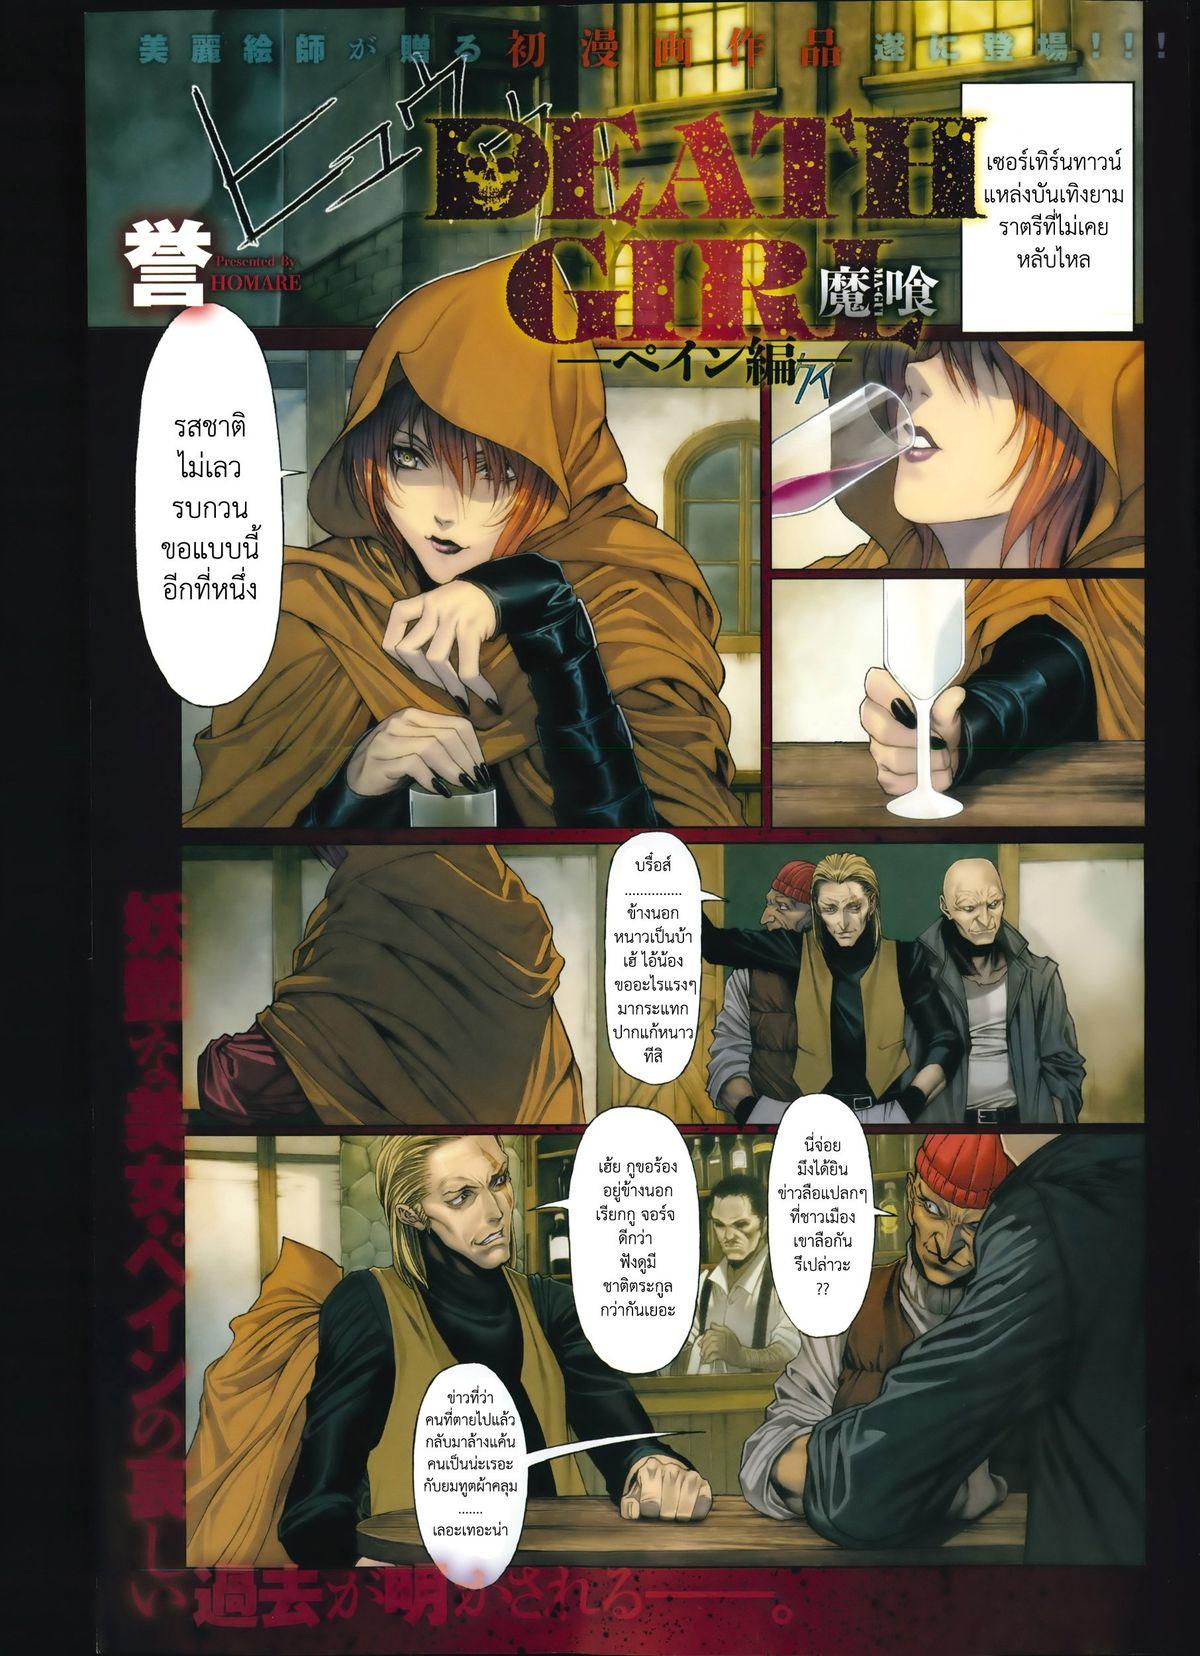 Ma-Gui -DEATH GIRL- Pain Hen | Evil Eaters -DEATH'S GIRLS- ภาษาไทย (COMIC Anthurium 015 2014-07) [Thai ภาษาไทย]